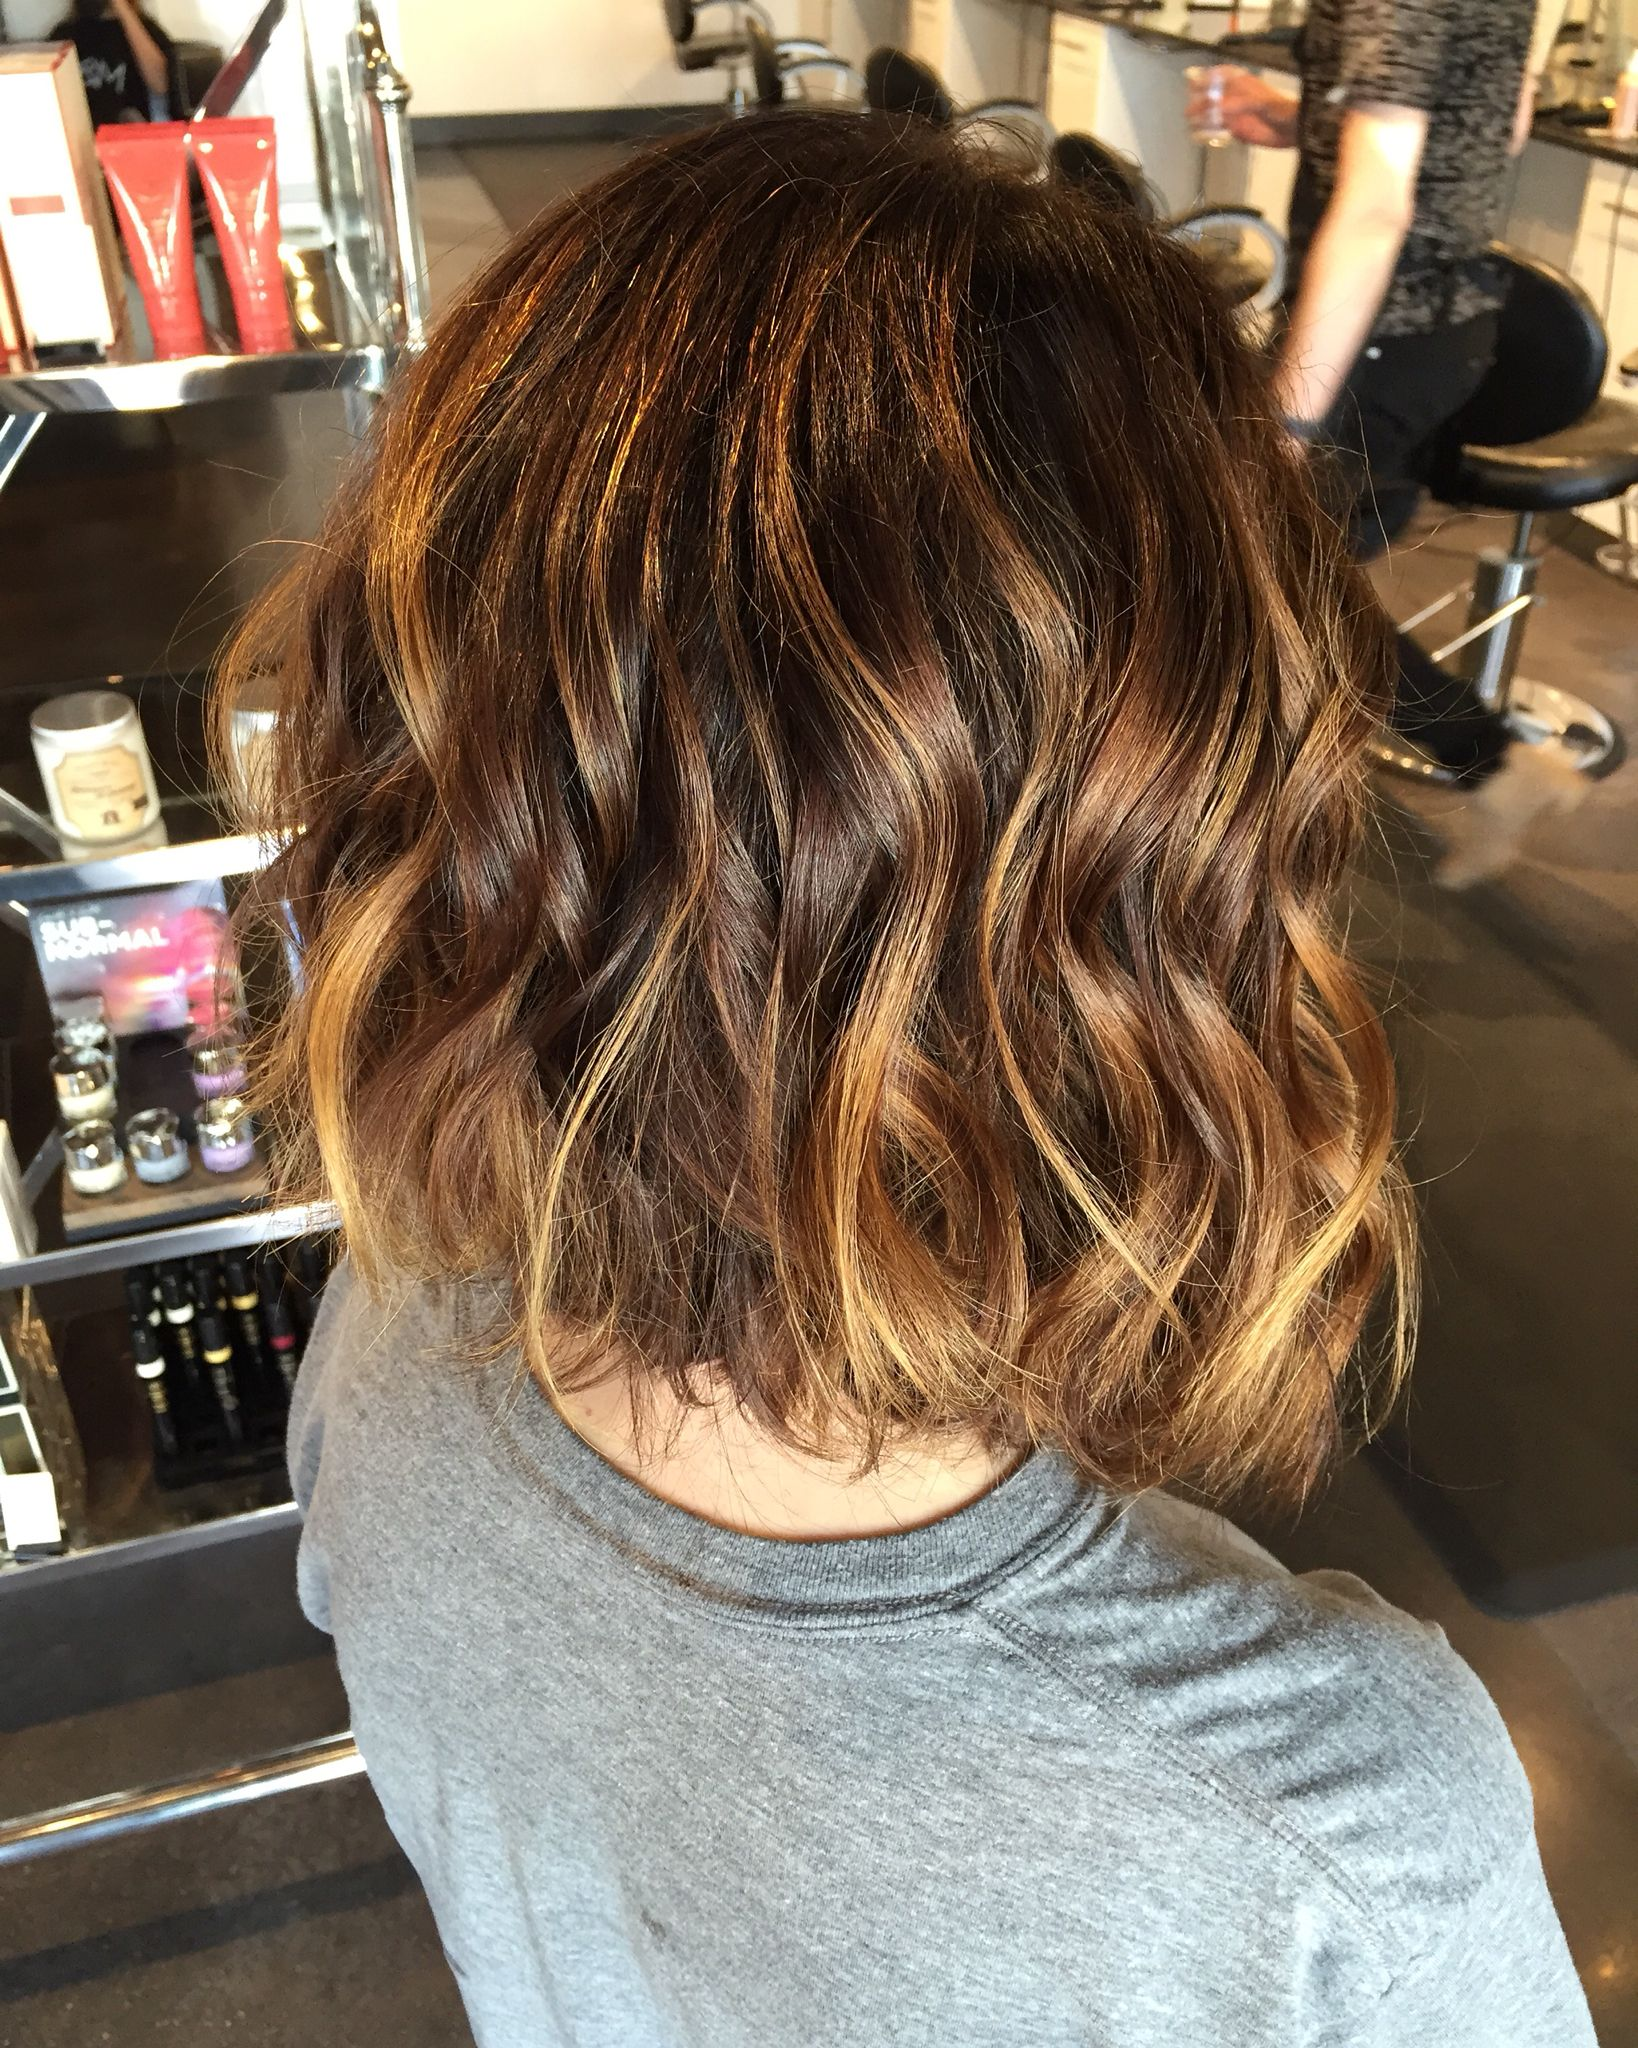 Caramel Balayage On Short Chocolate Brown Hair Beachy Sun Kissed Waves On Short Hair Chocolate Brown Hair Balayage Hair Balayage Hair Caramel